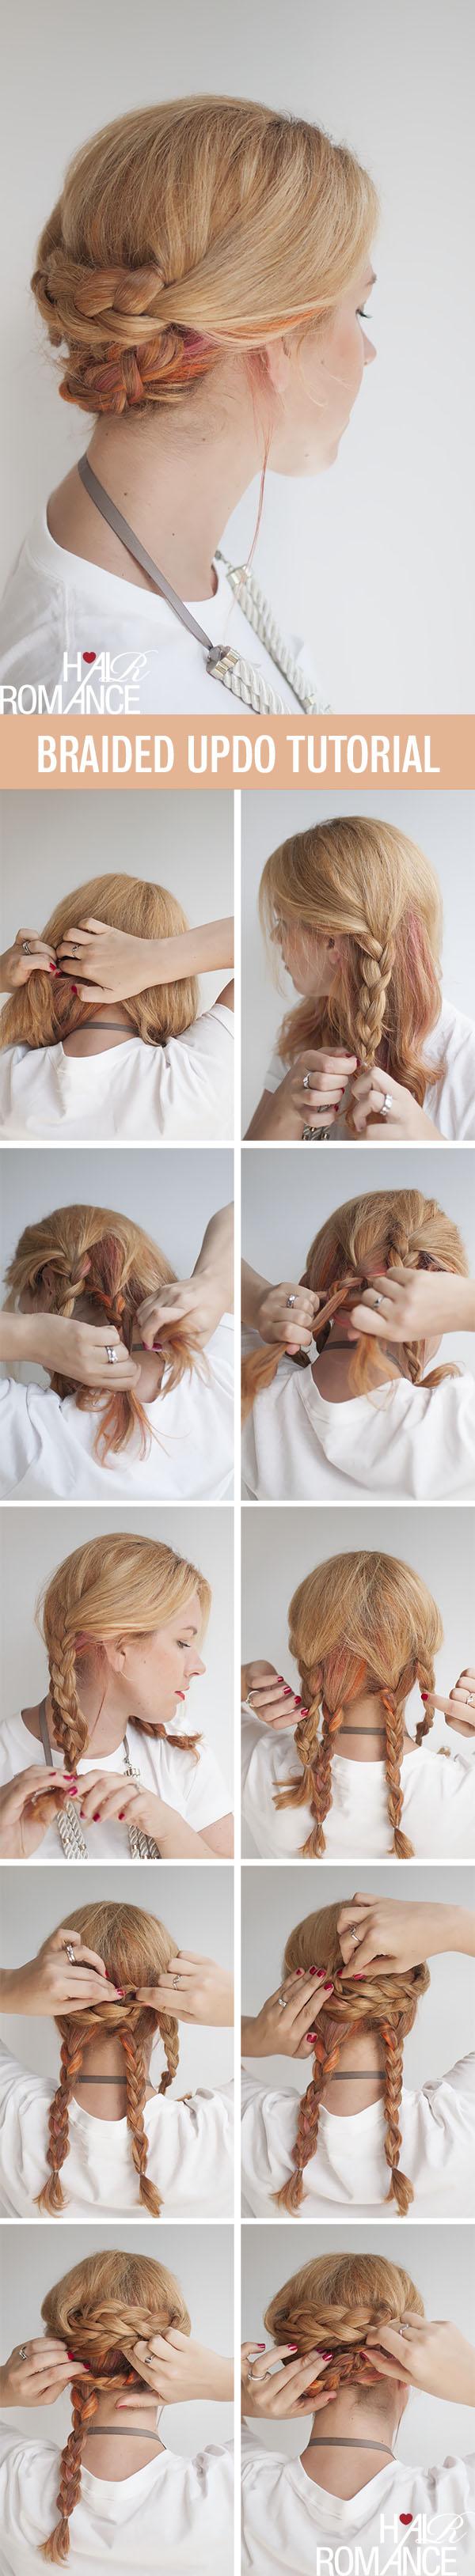 Hair Romance - Easy braided updo hairstyle tutorial